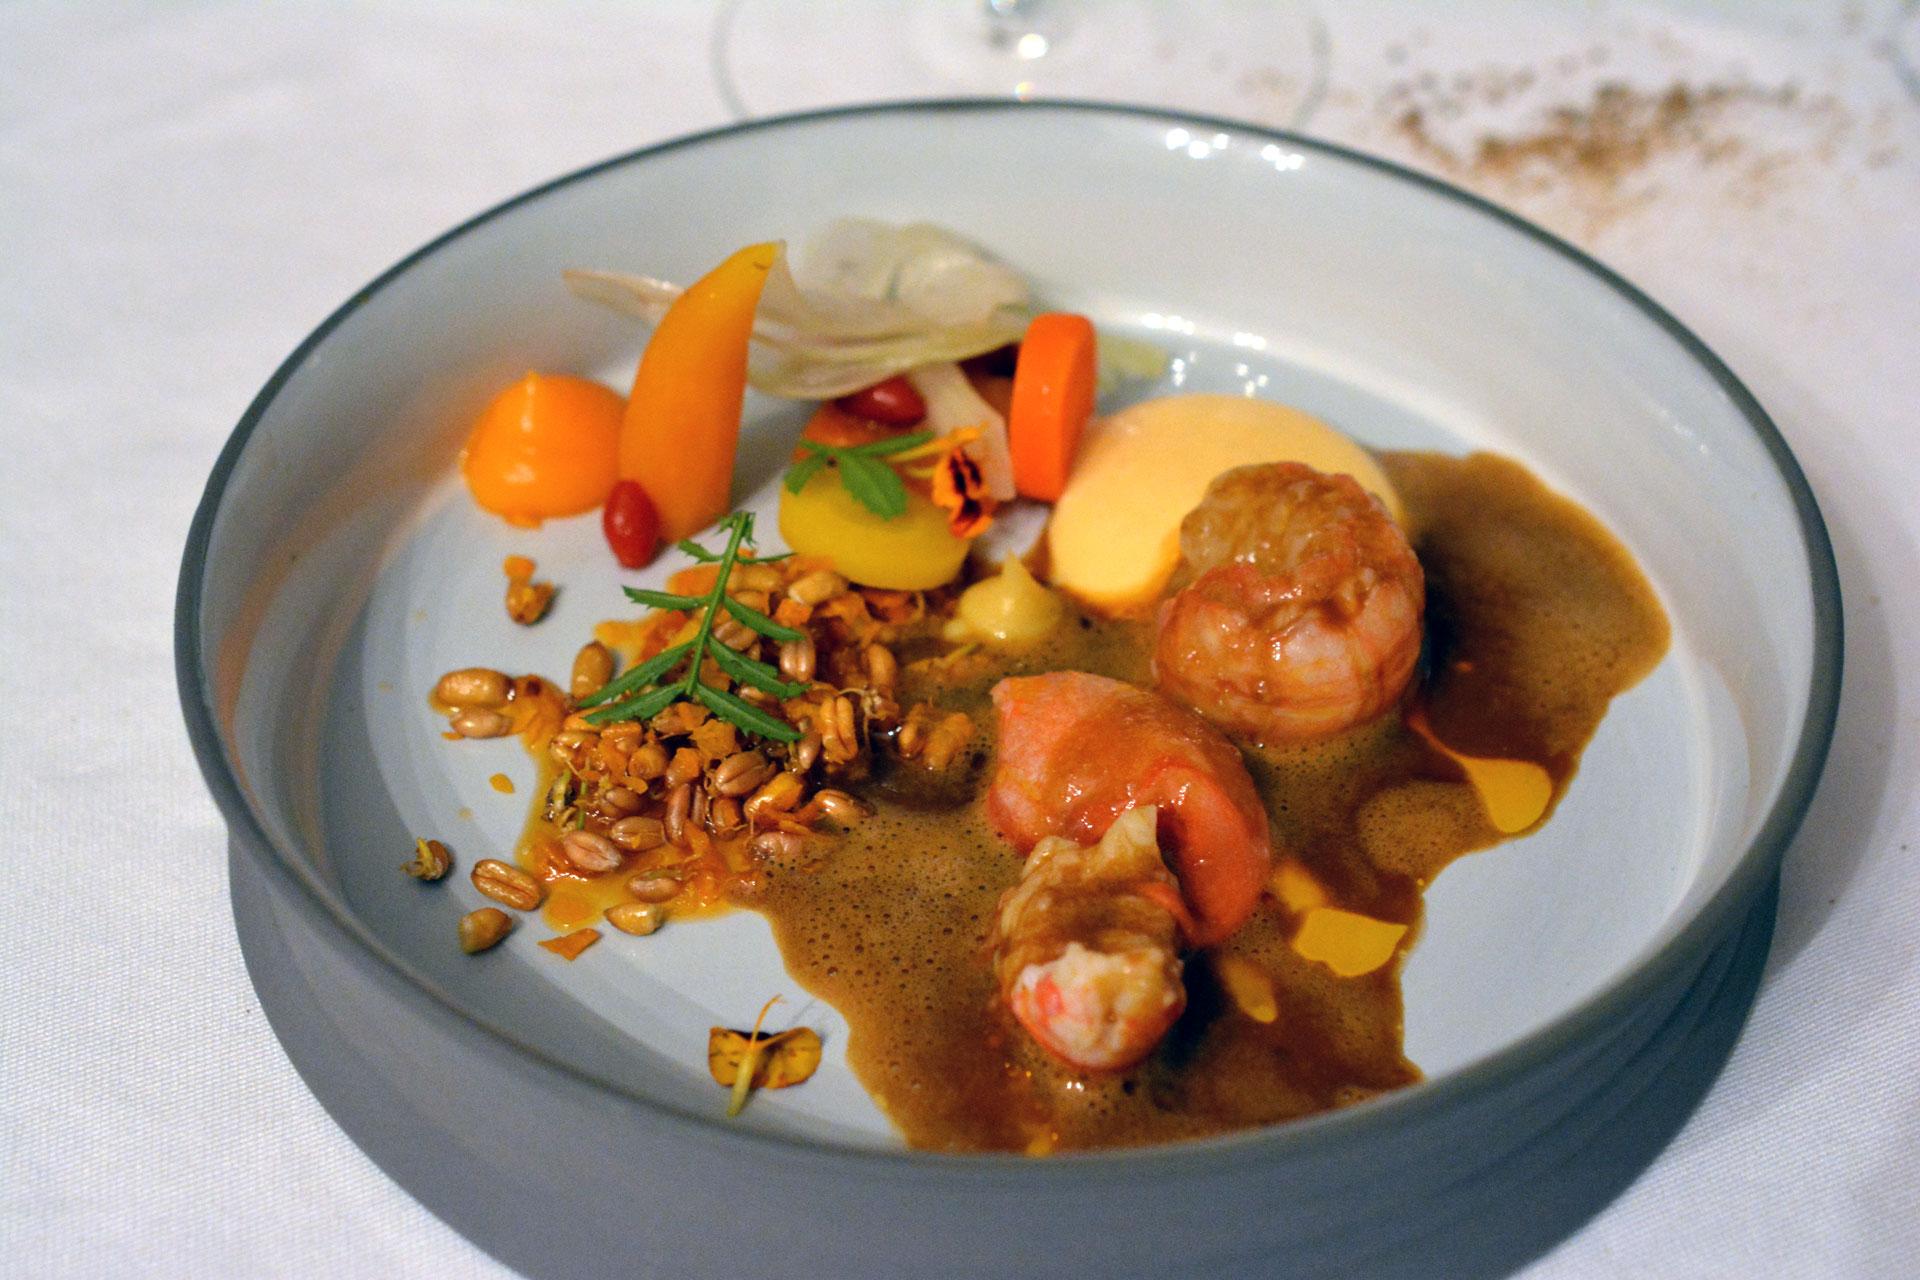 Stegersbacher Flusskrebse: Süßkartoffeln / Fenchel / Karotten / Gerösteter Krebsfond / Weizensprossen / Tagetes